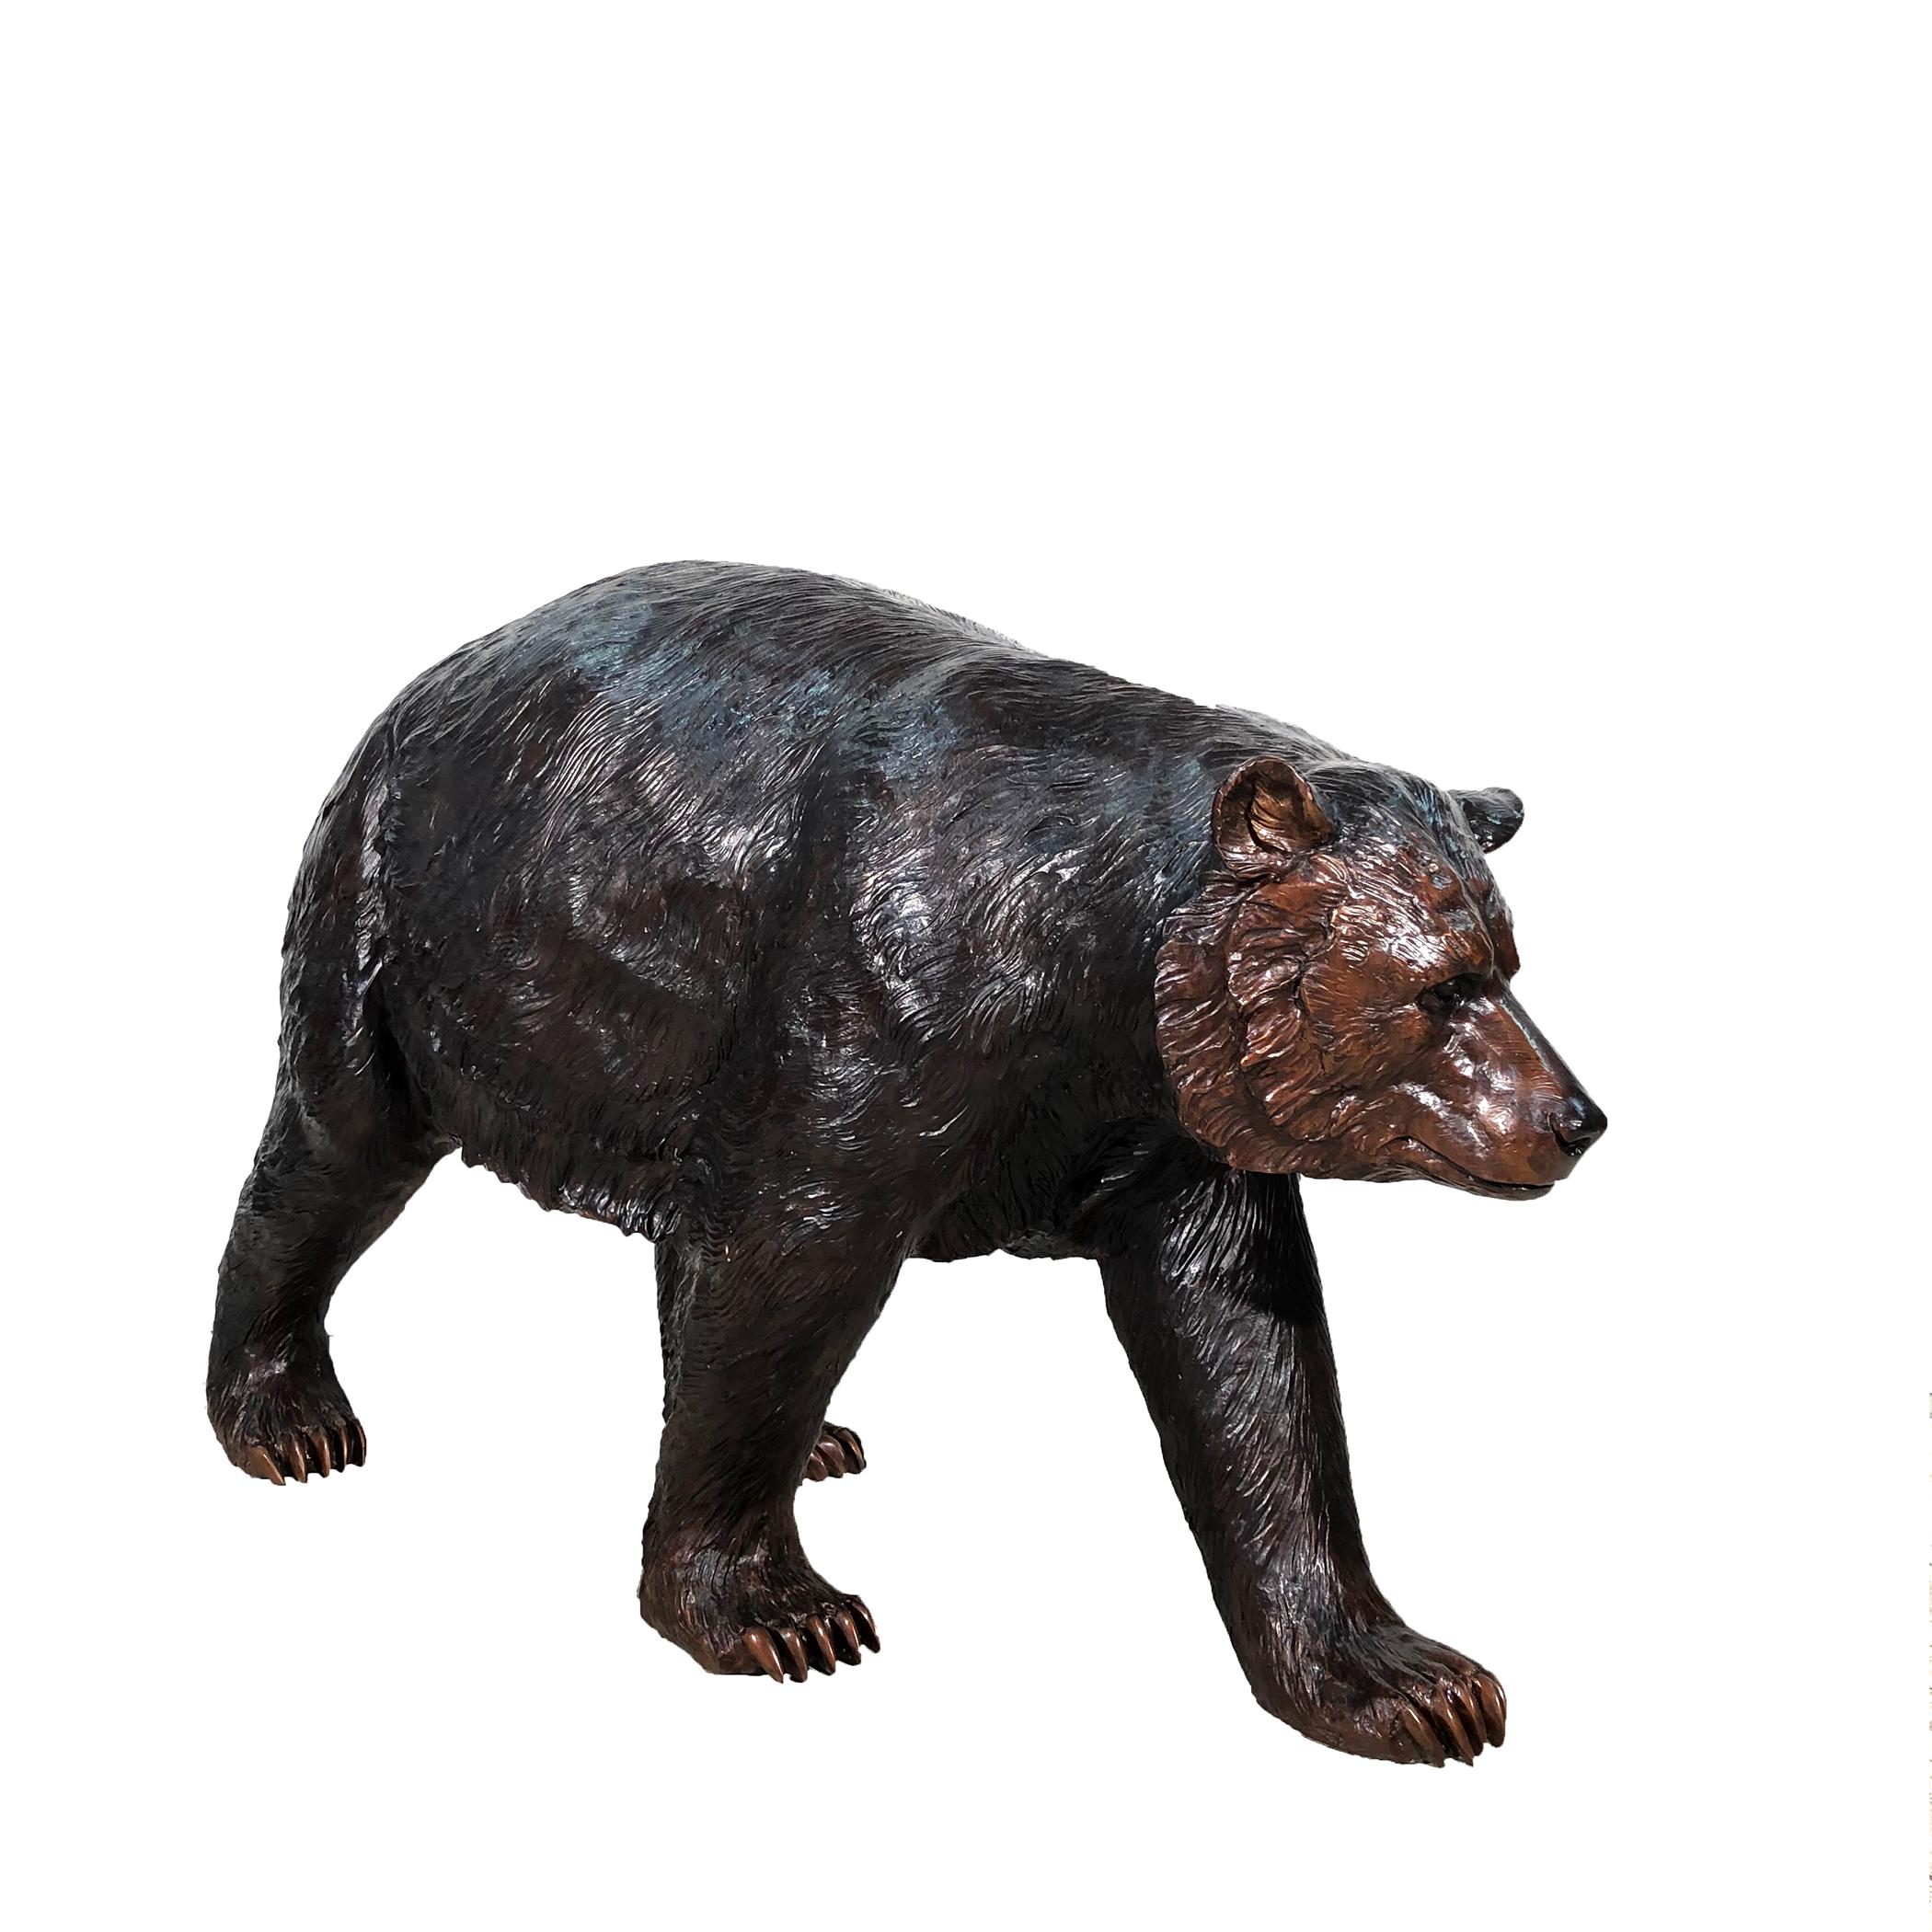 SRB099885 Bronze Blazer the Black Bear Sculpture Exclusive by Metropolitan Galleries Inc 2